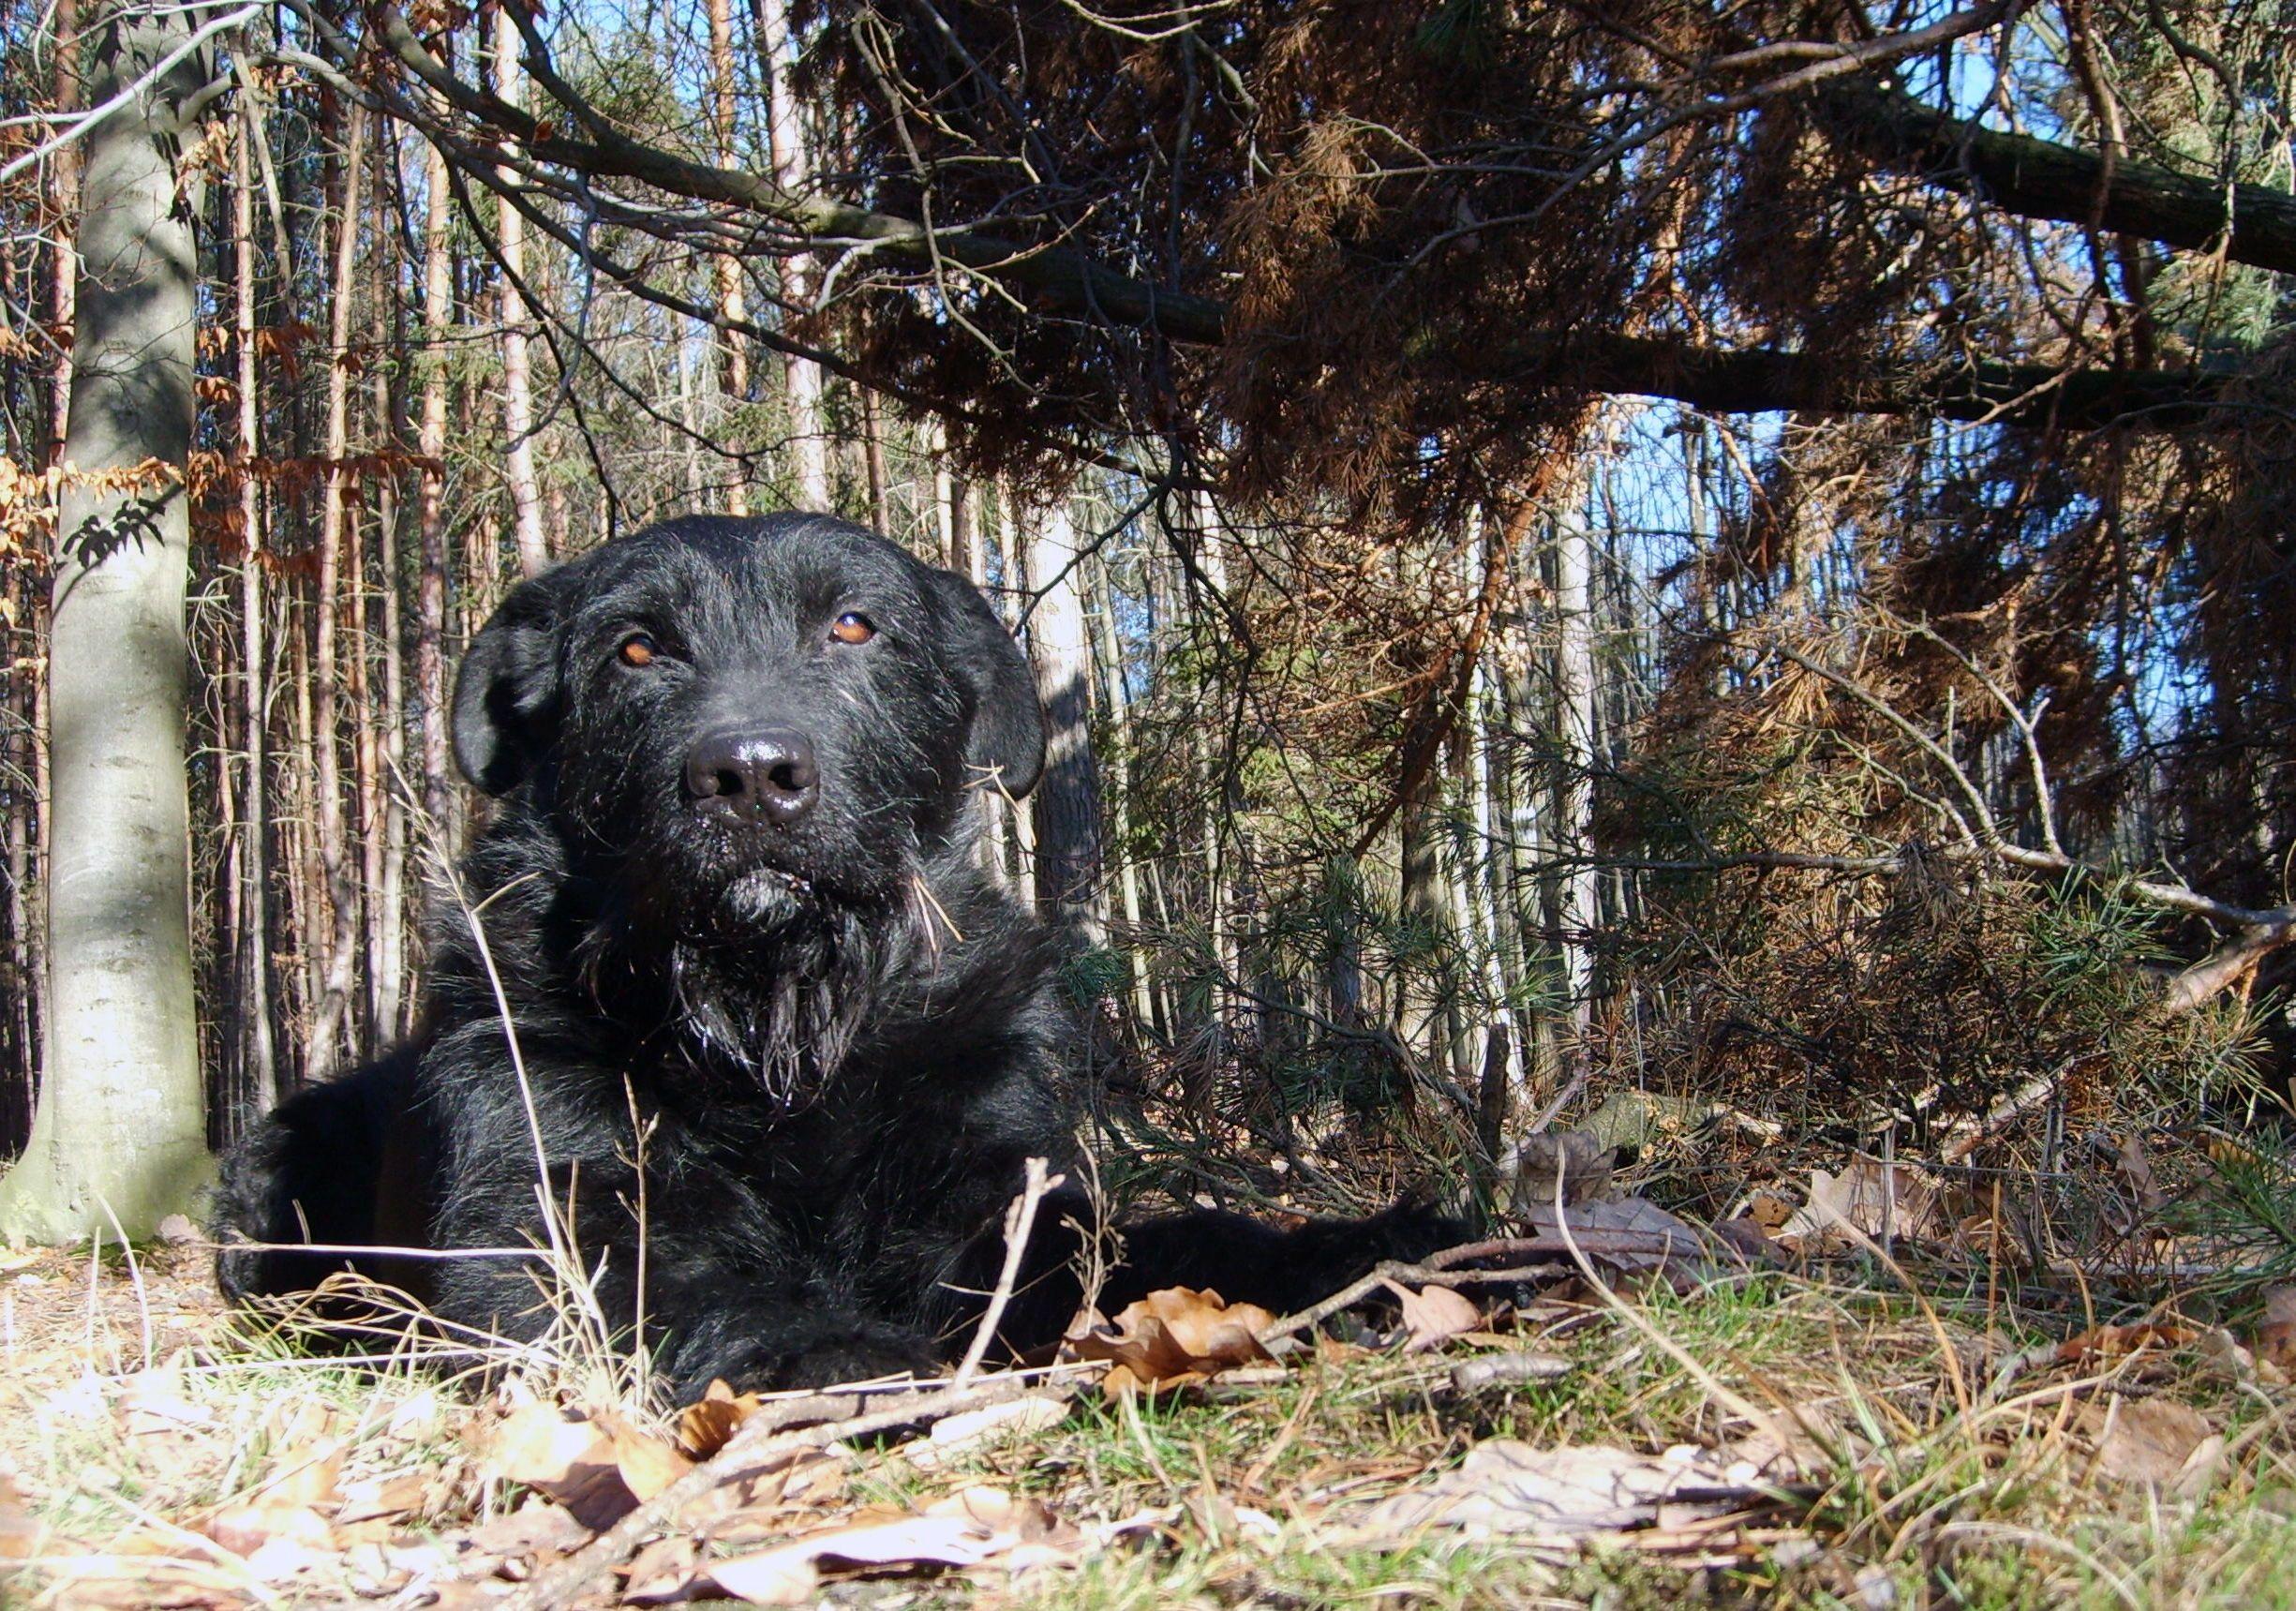 lying black dog free stock images by libreshot